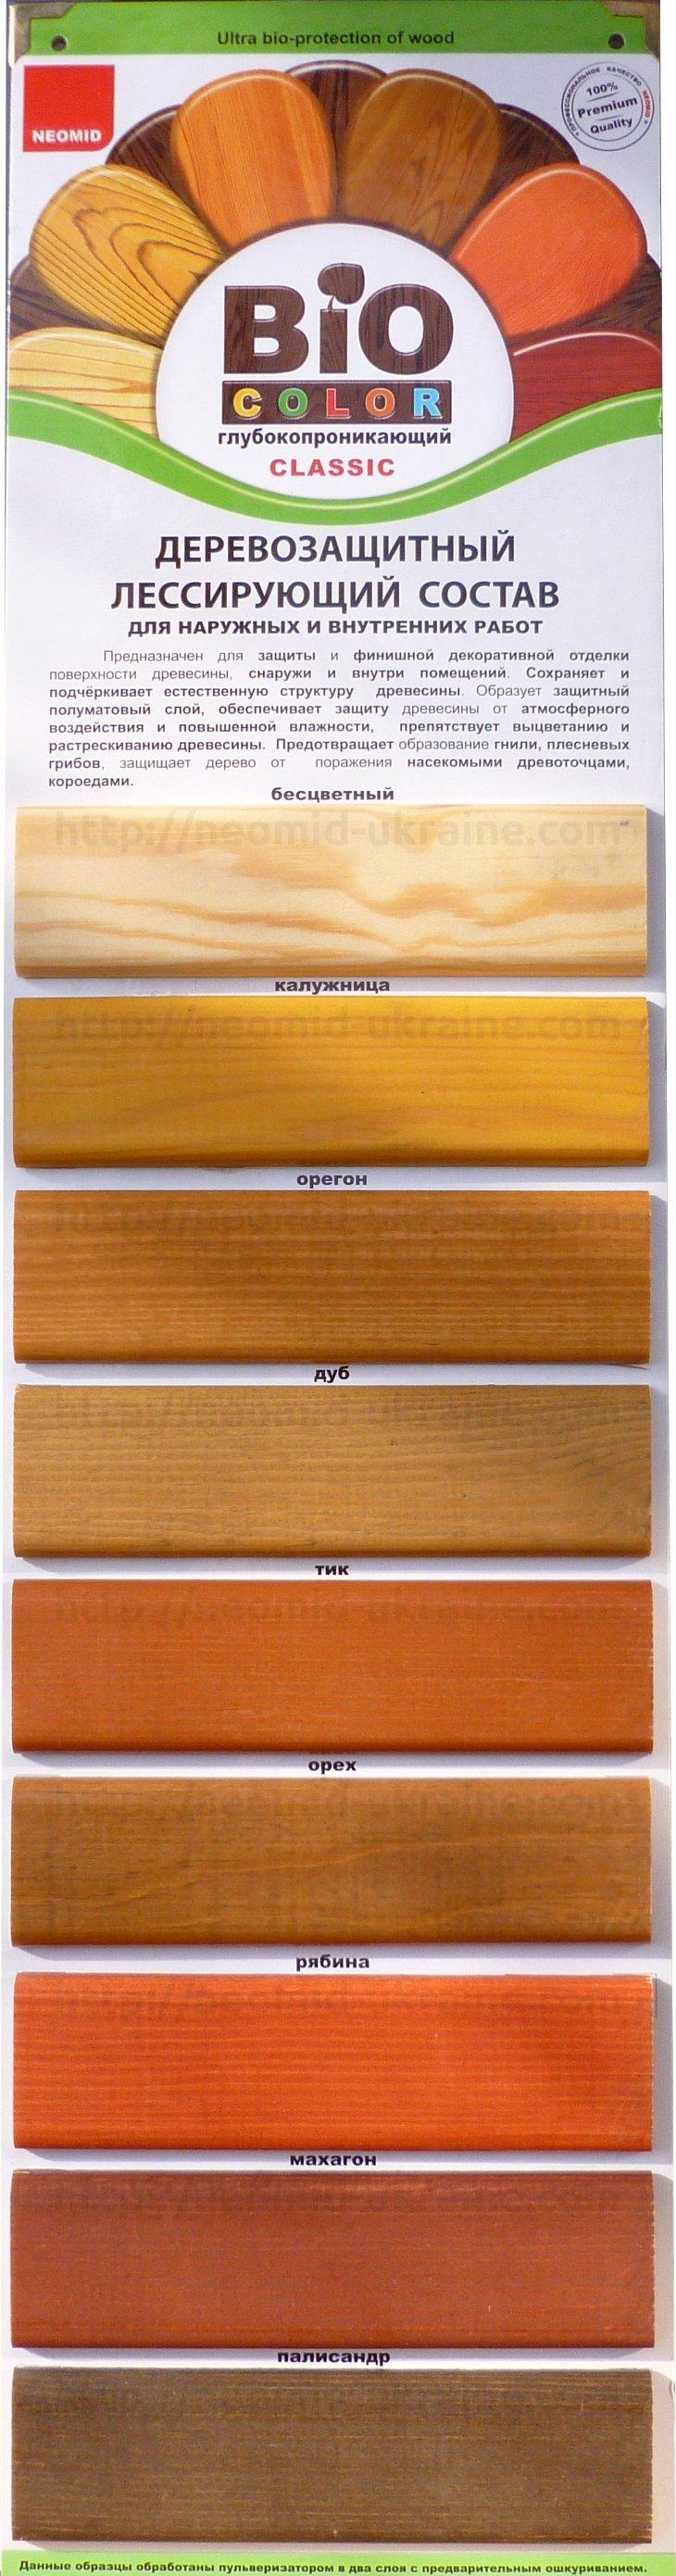 Цветовая палитра лессирующего антисептика Неомид Bio Color Classic.